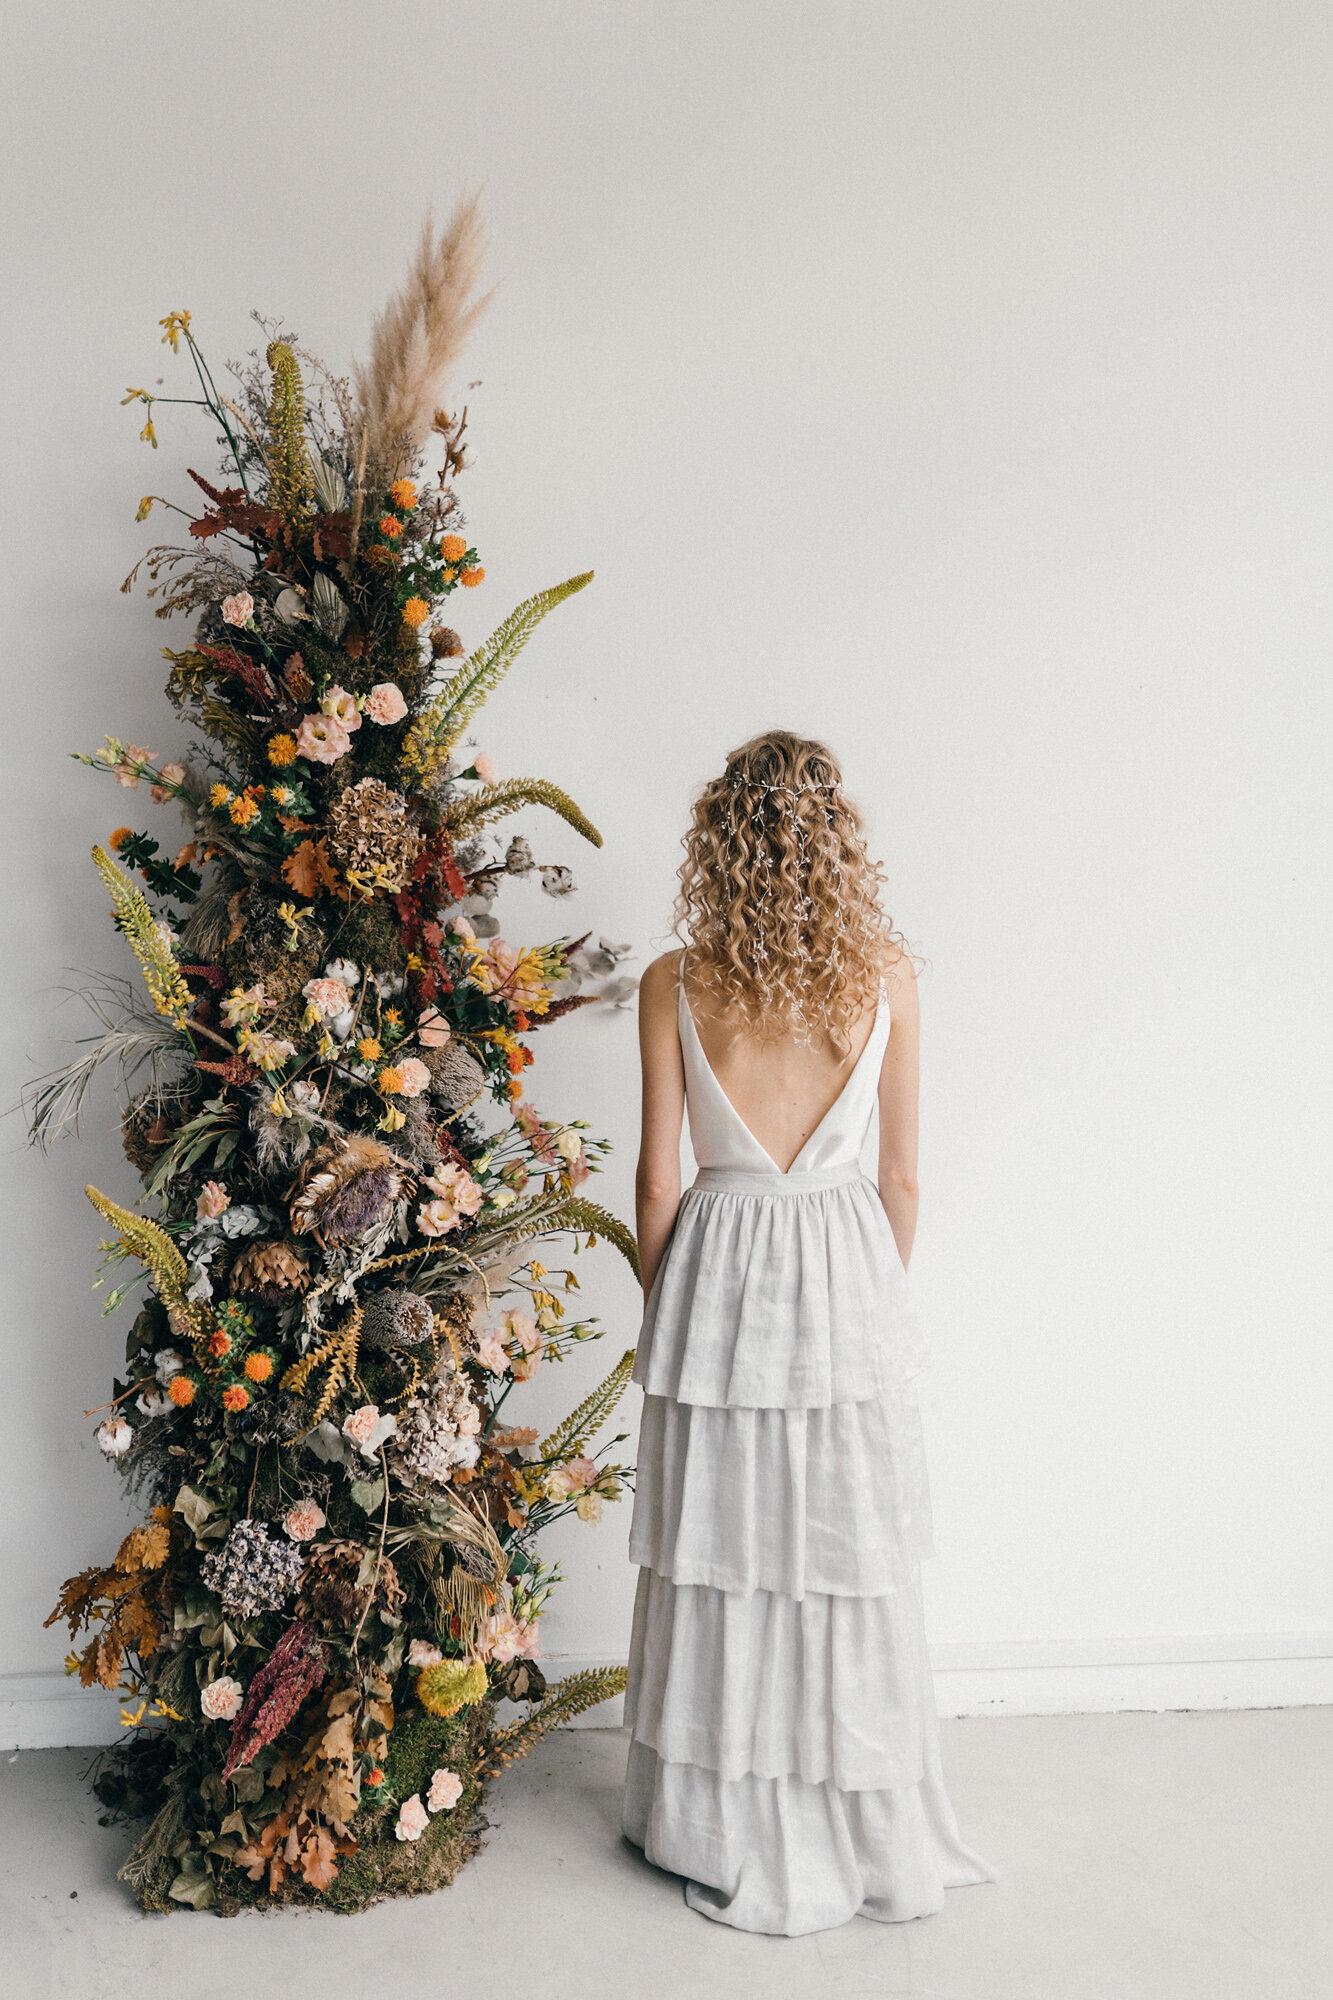 Debbie-Carlisle-Bridal-Accessories-Kate-Beaumont-Wedding-Gowns-Sheffield-Yorkshire-UK-18.jpg